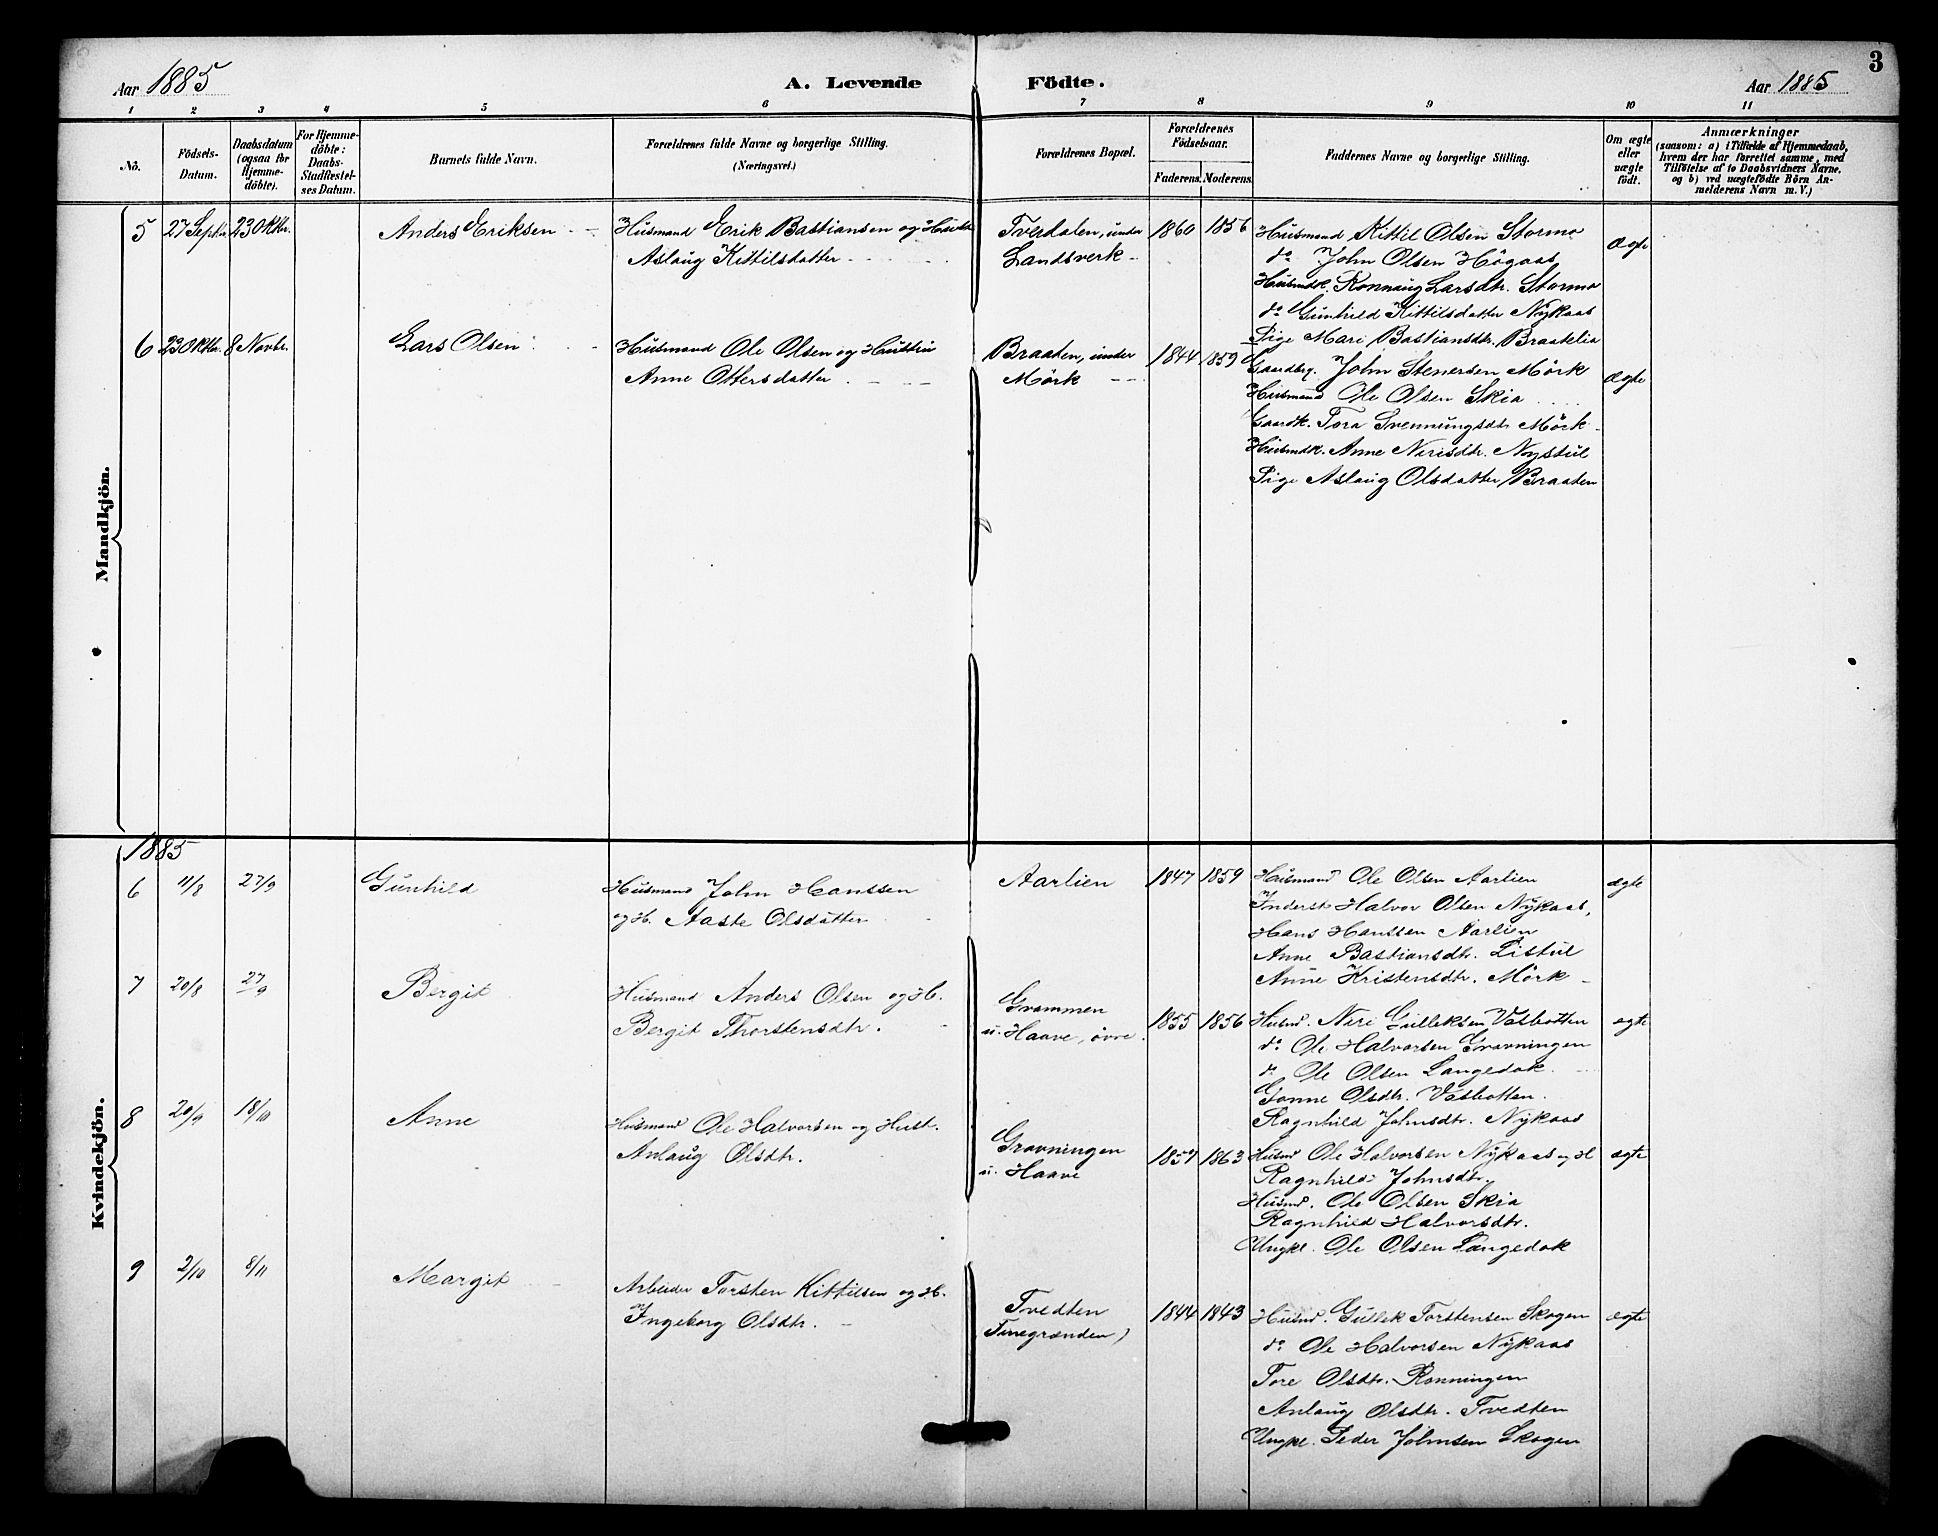 SAKO, Heddal kirkebøker, F/Fb/L0001: Ministerialbok nr. II 1, 1884-1910, s. 3